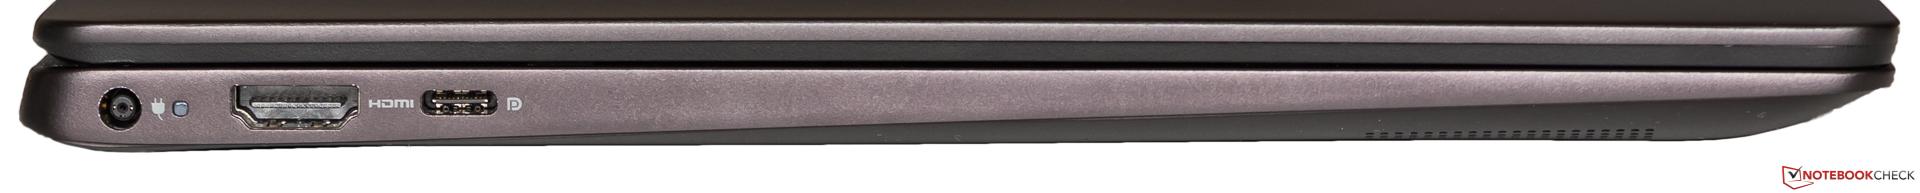 Dell Inspiron 13 7386 2-in-1 Black Edition (i7-8565U, 16 GB RAM, 512